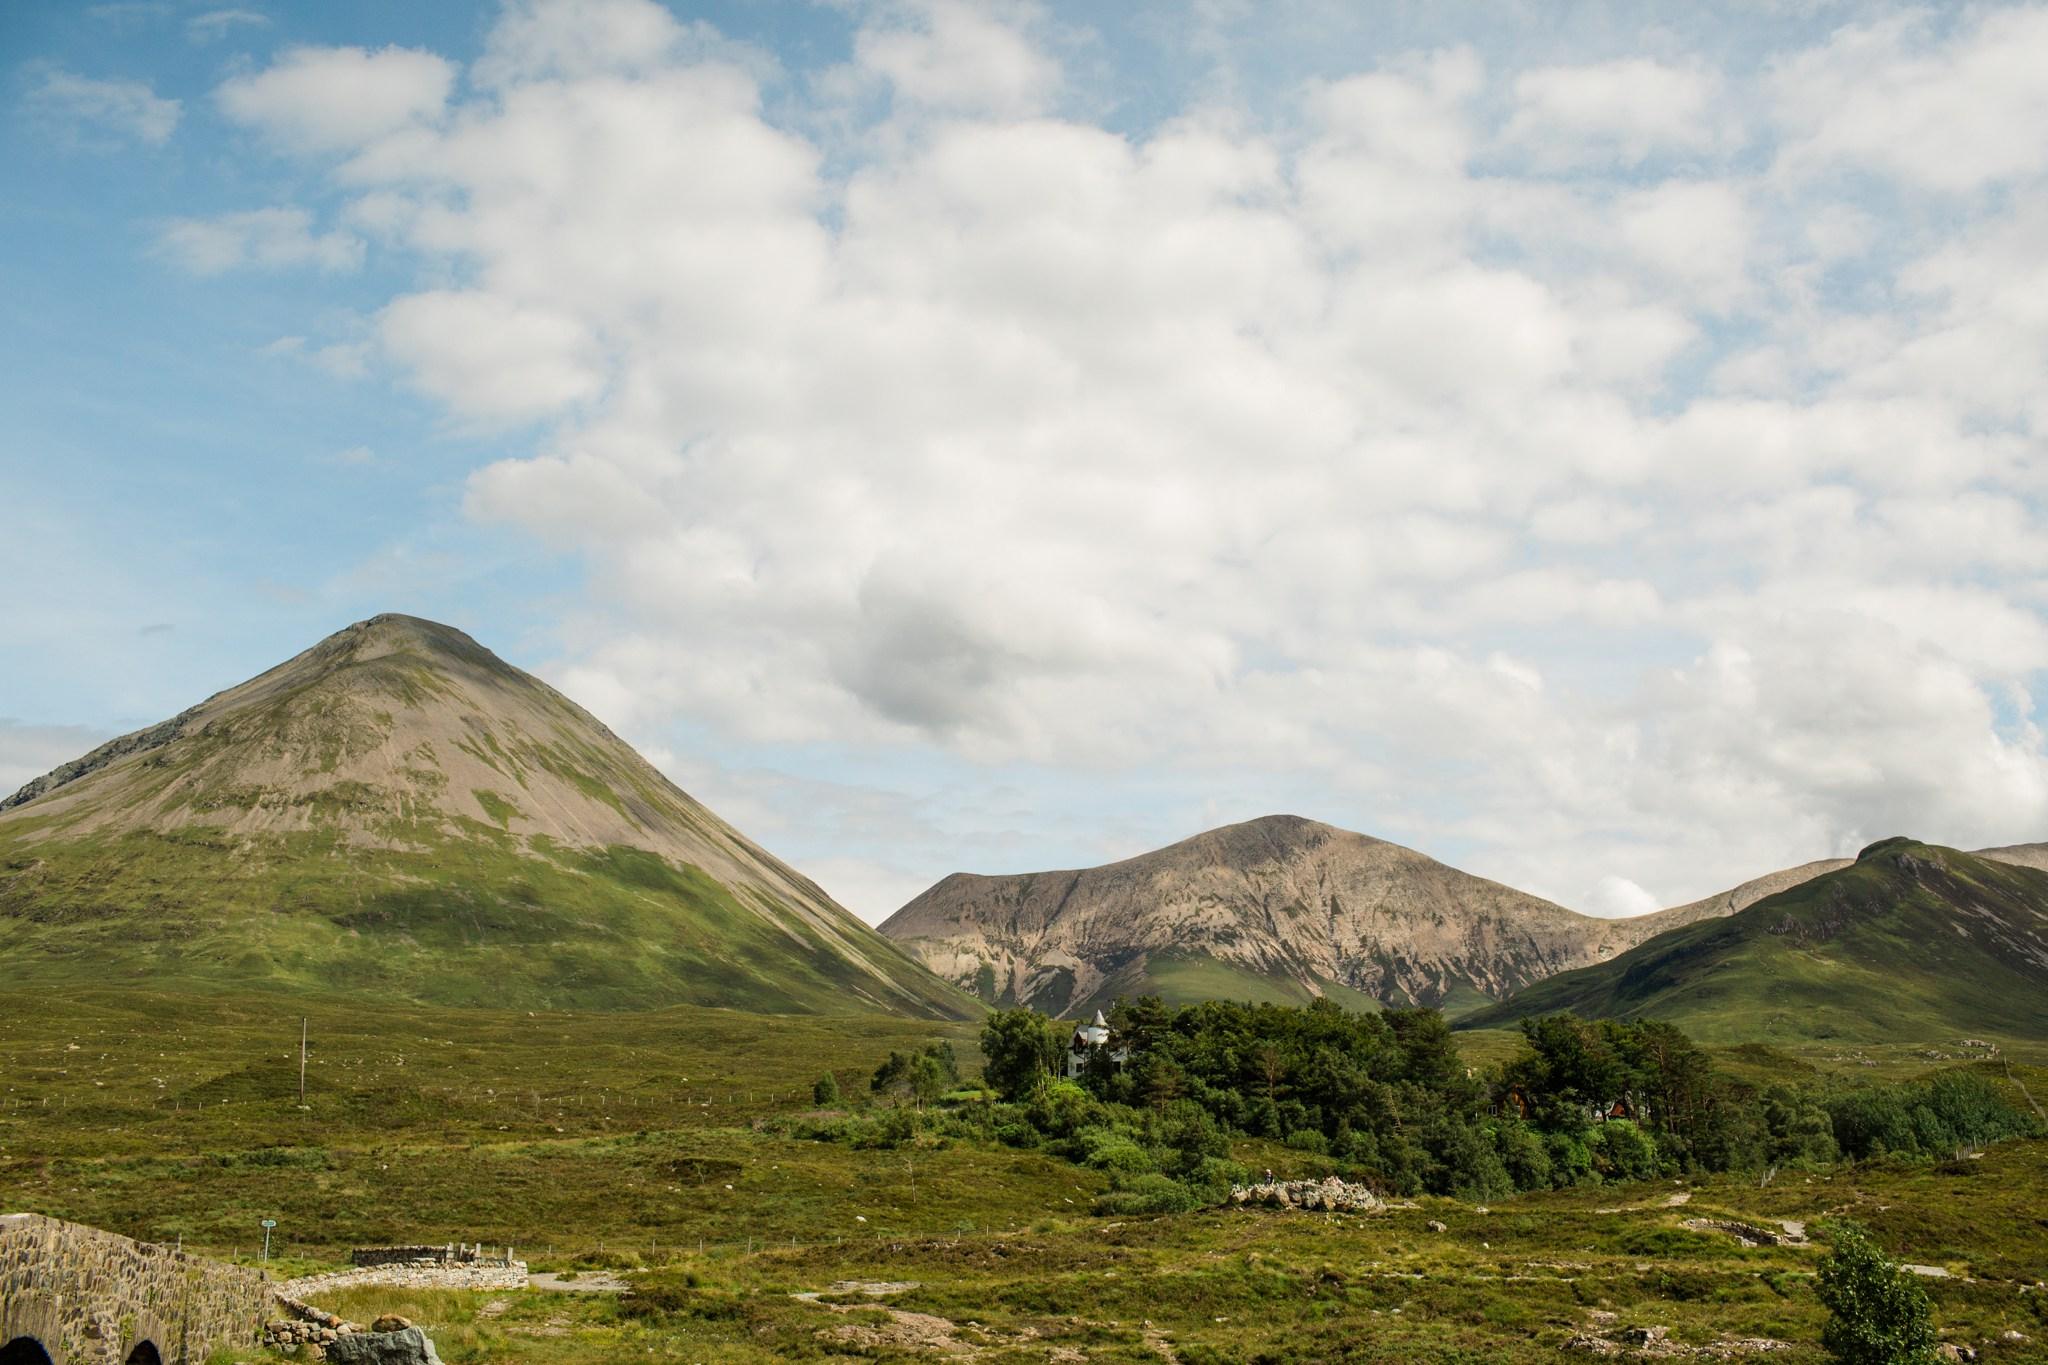 scotland_highlands_deborah_zoe_0076.JPG